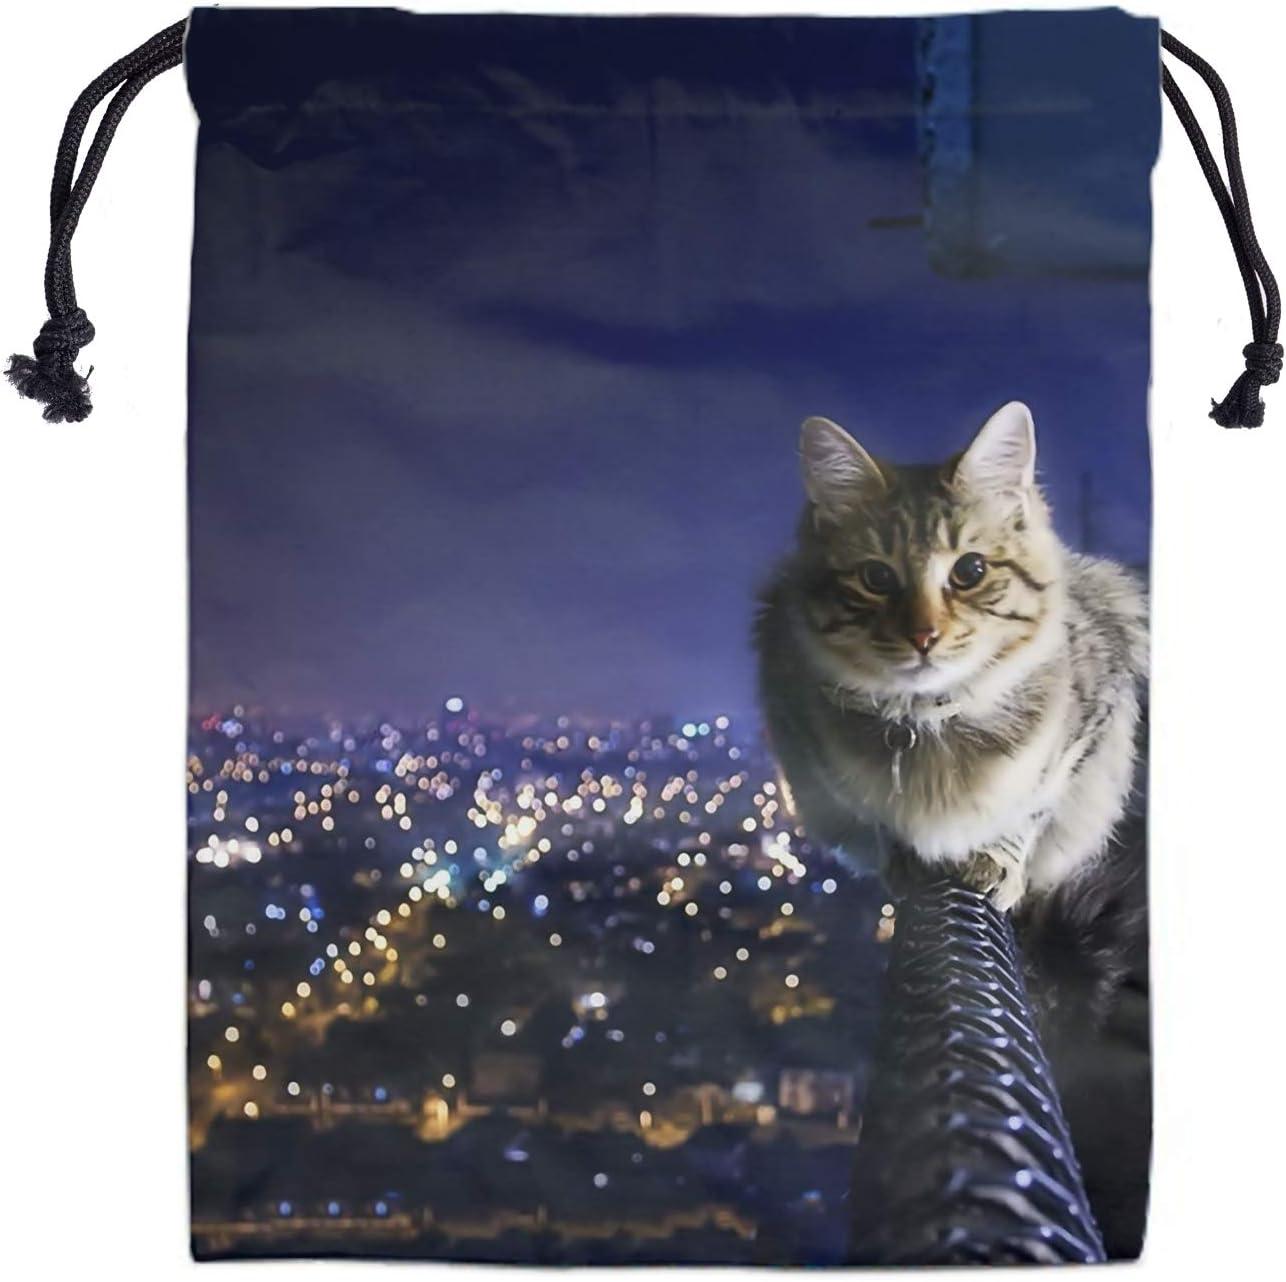 Cat Ranking TOP18 Drawstring Storage Bag Special sale item Gym - Gymnastics Bags Grip for Girls